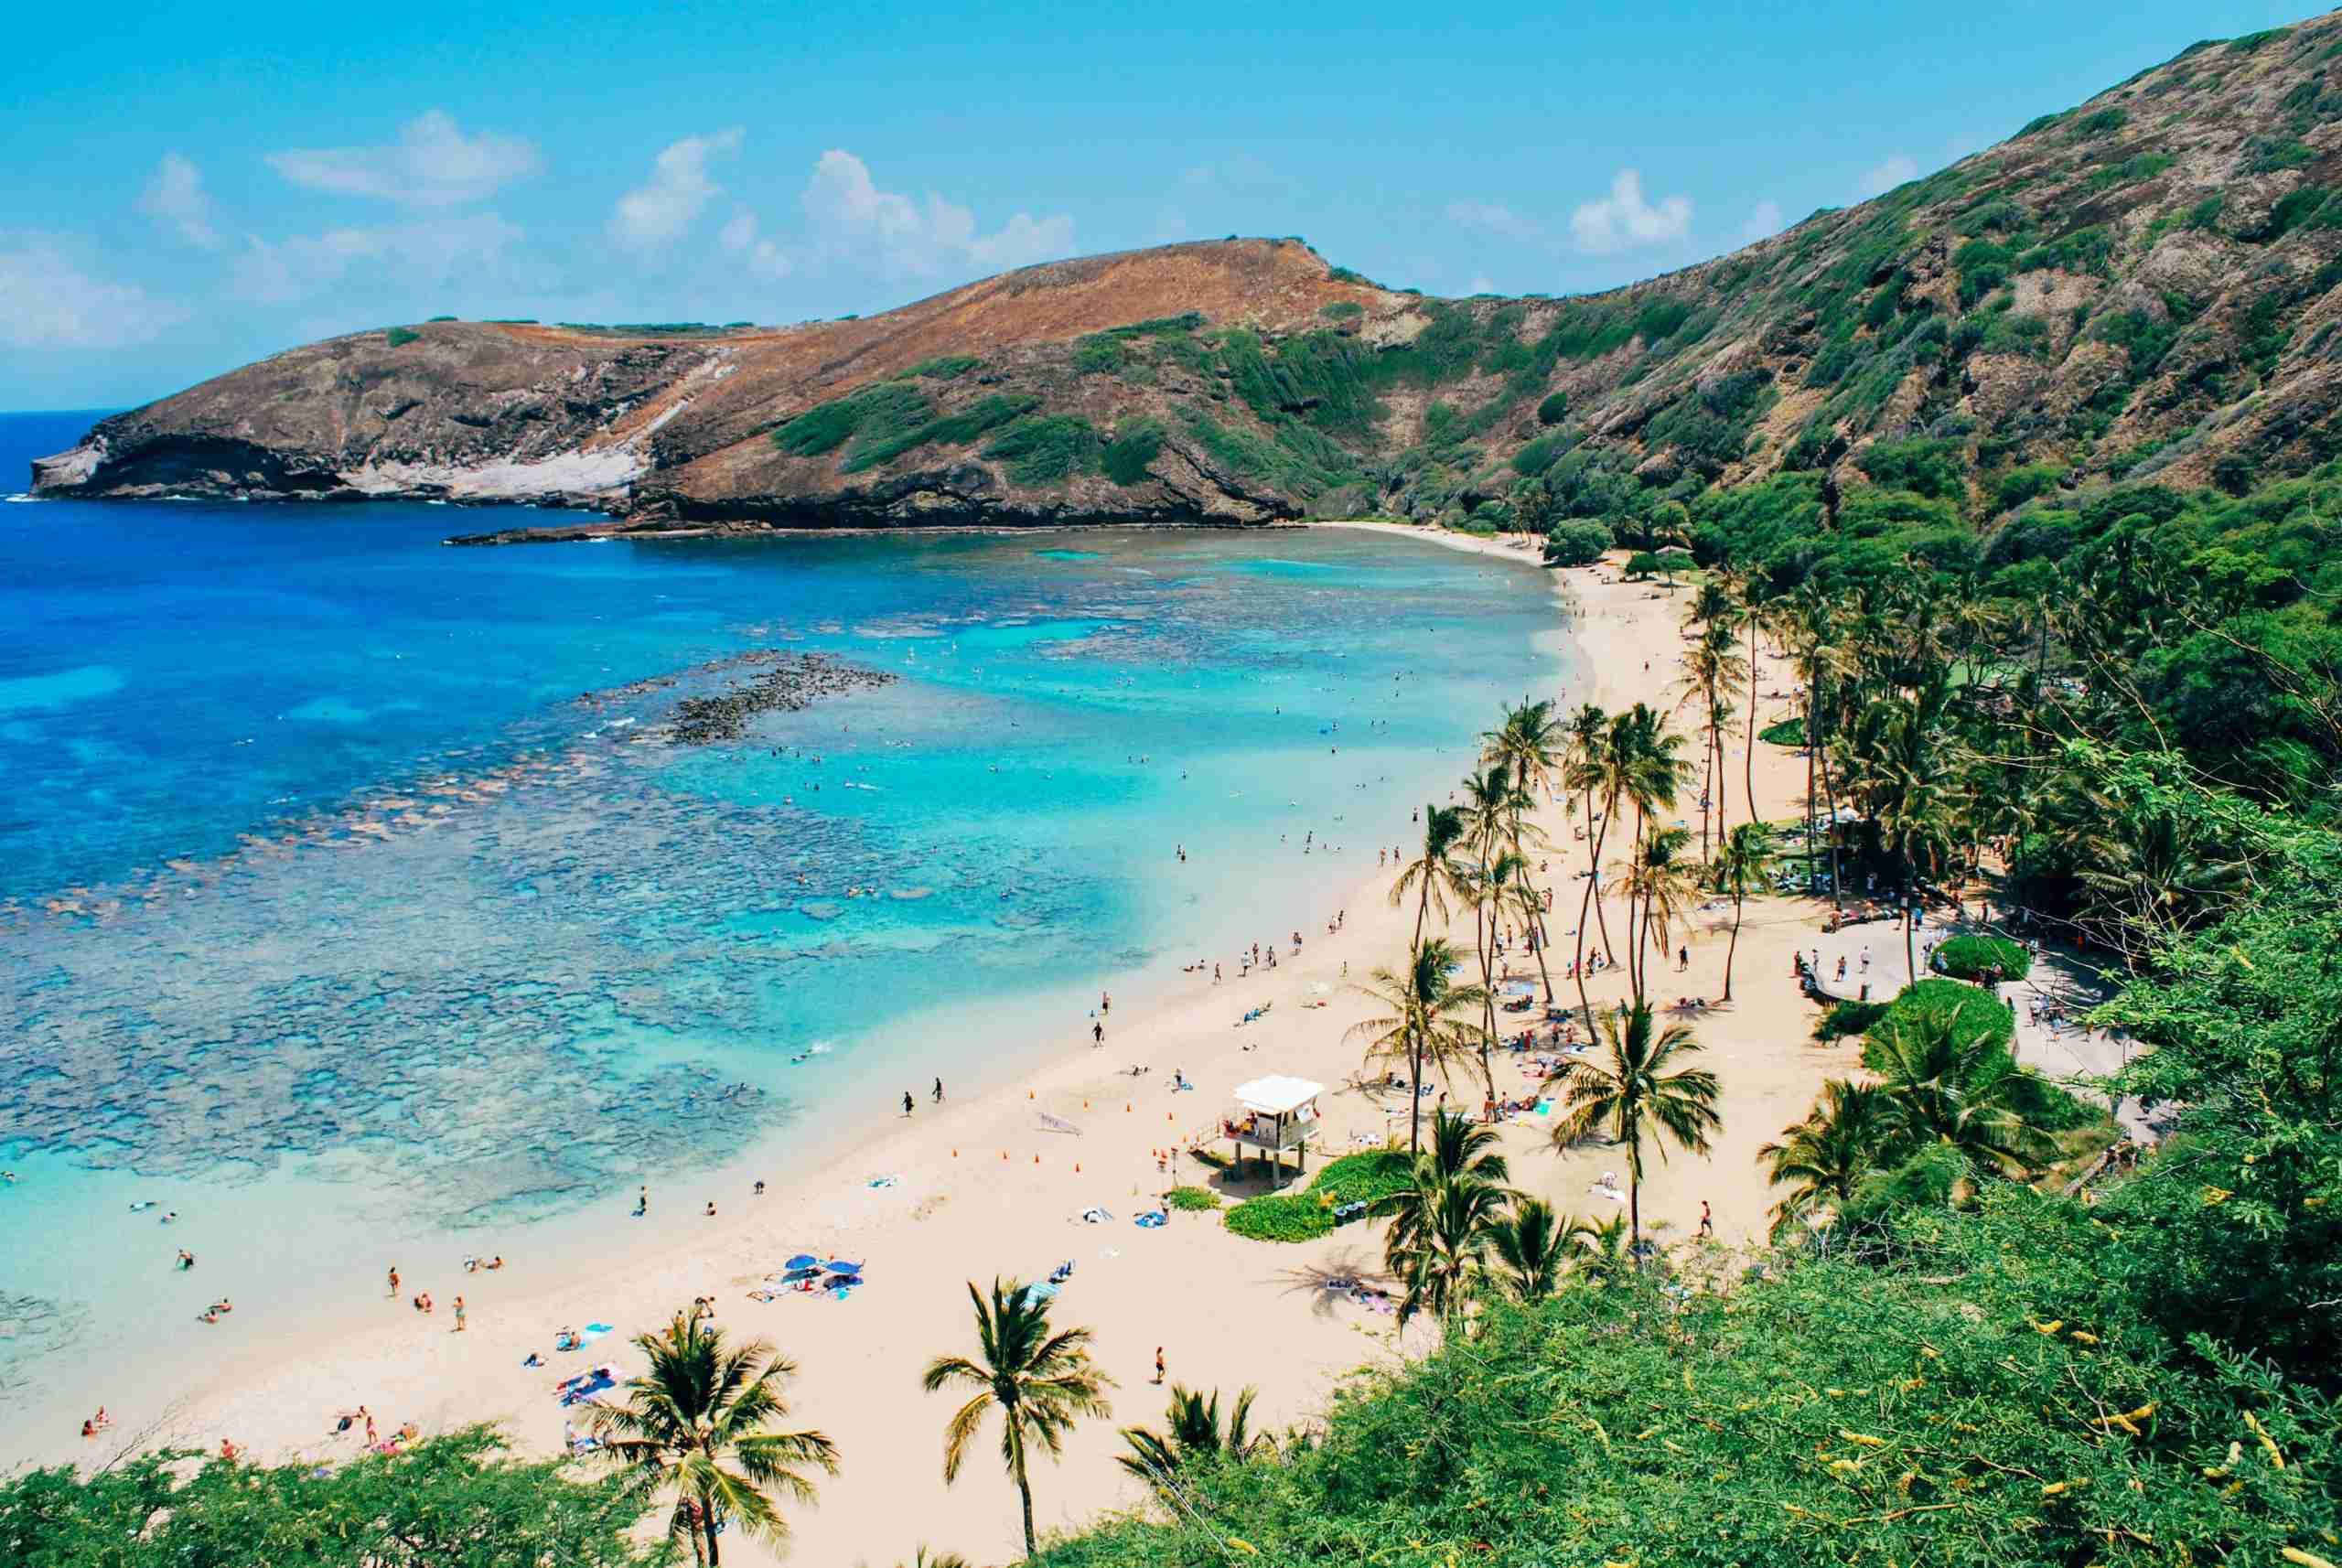 Honolulu, Hawaii. (Photo by Timur Alexandrov/EyeEm/Getty Images)